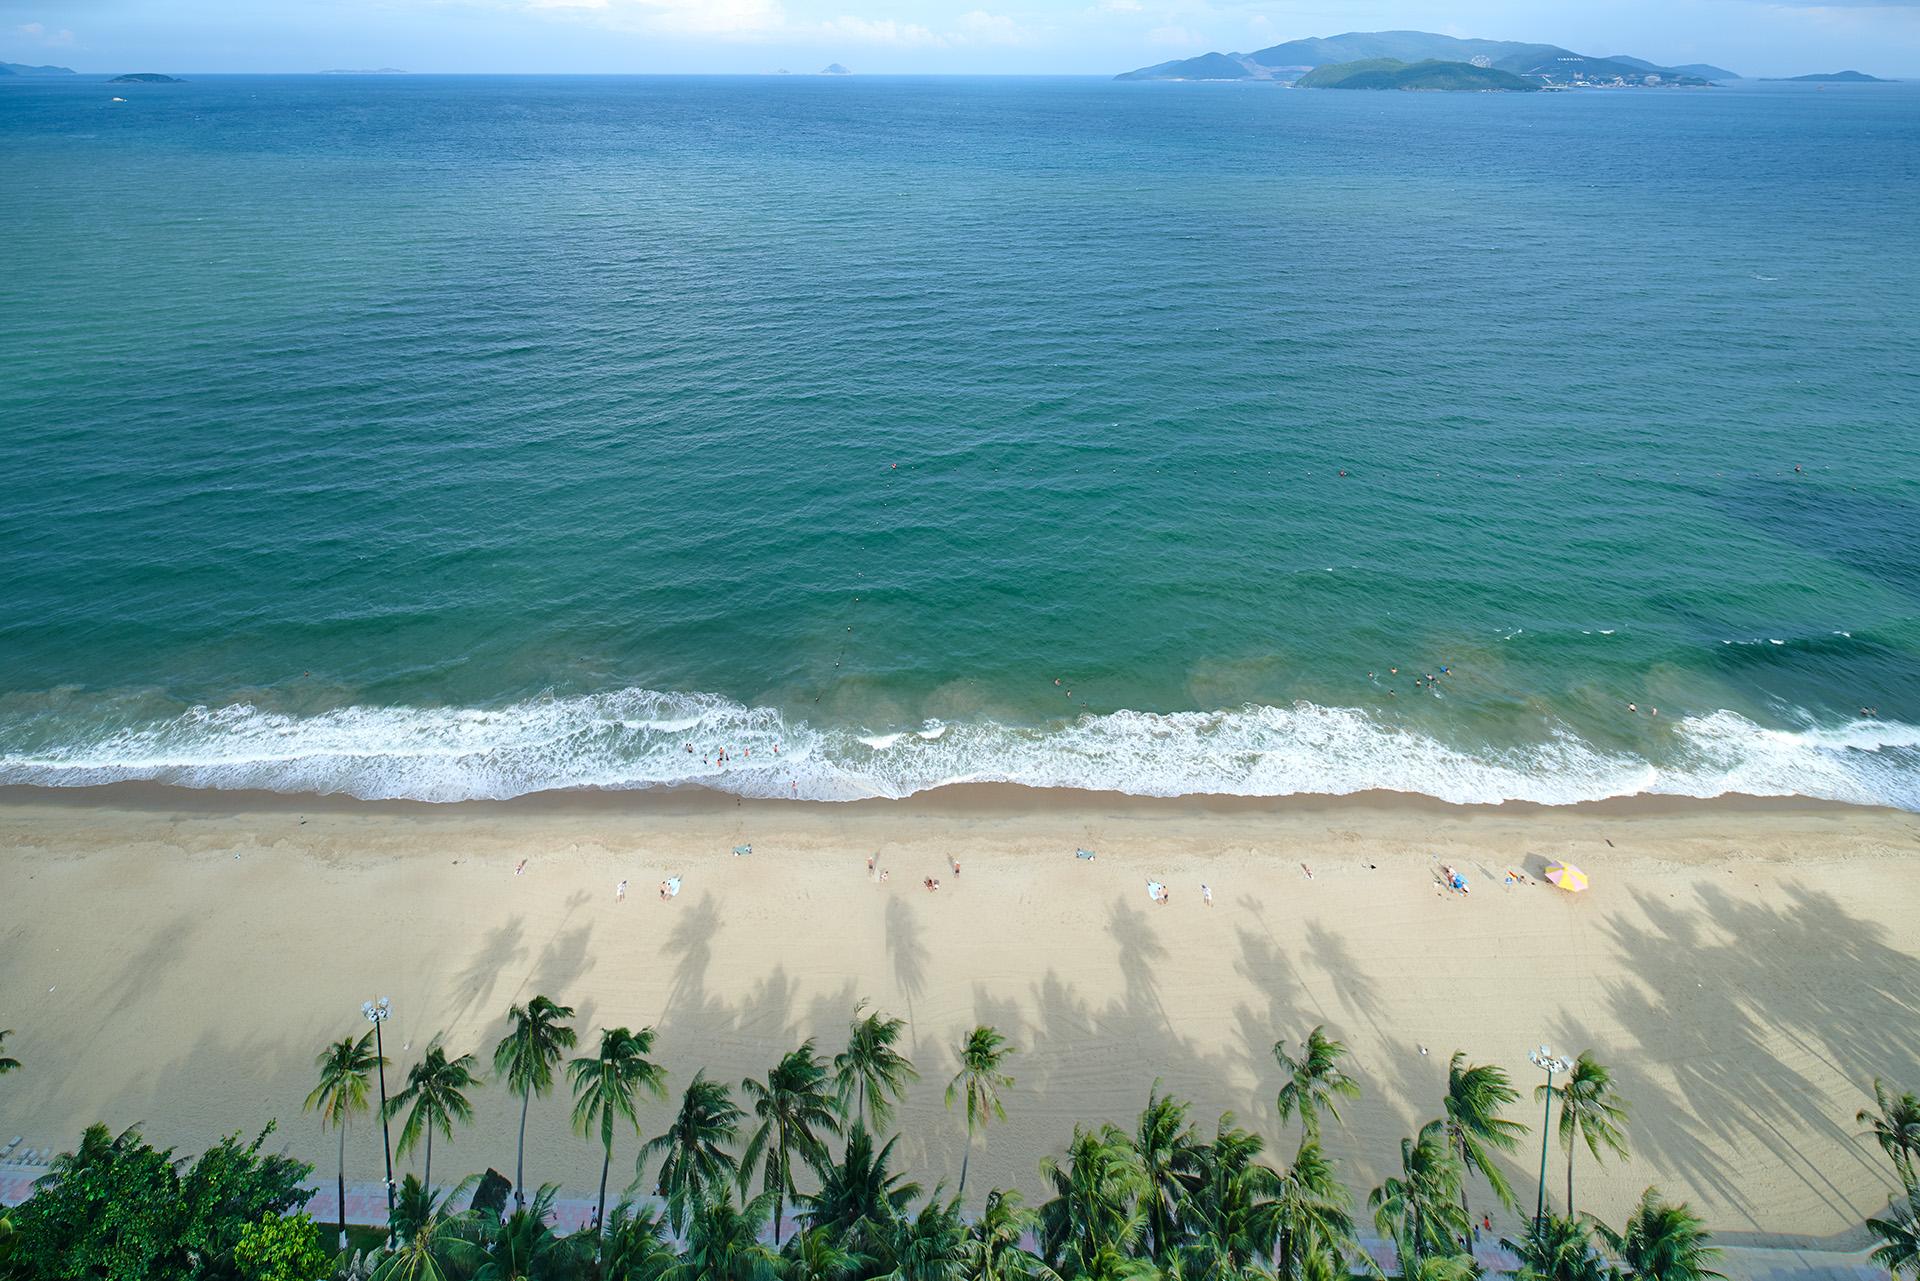 Sheraton Nha Trang Beach